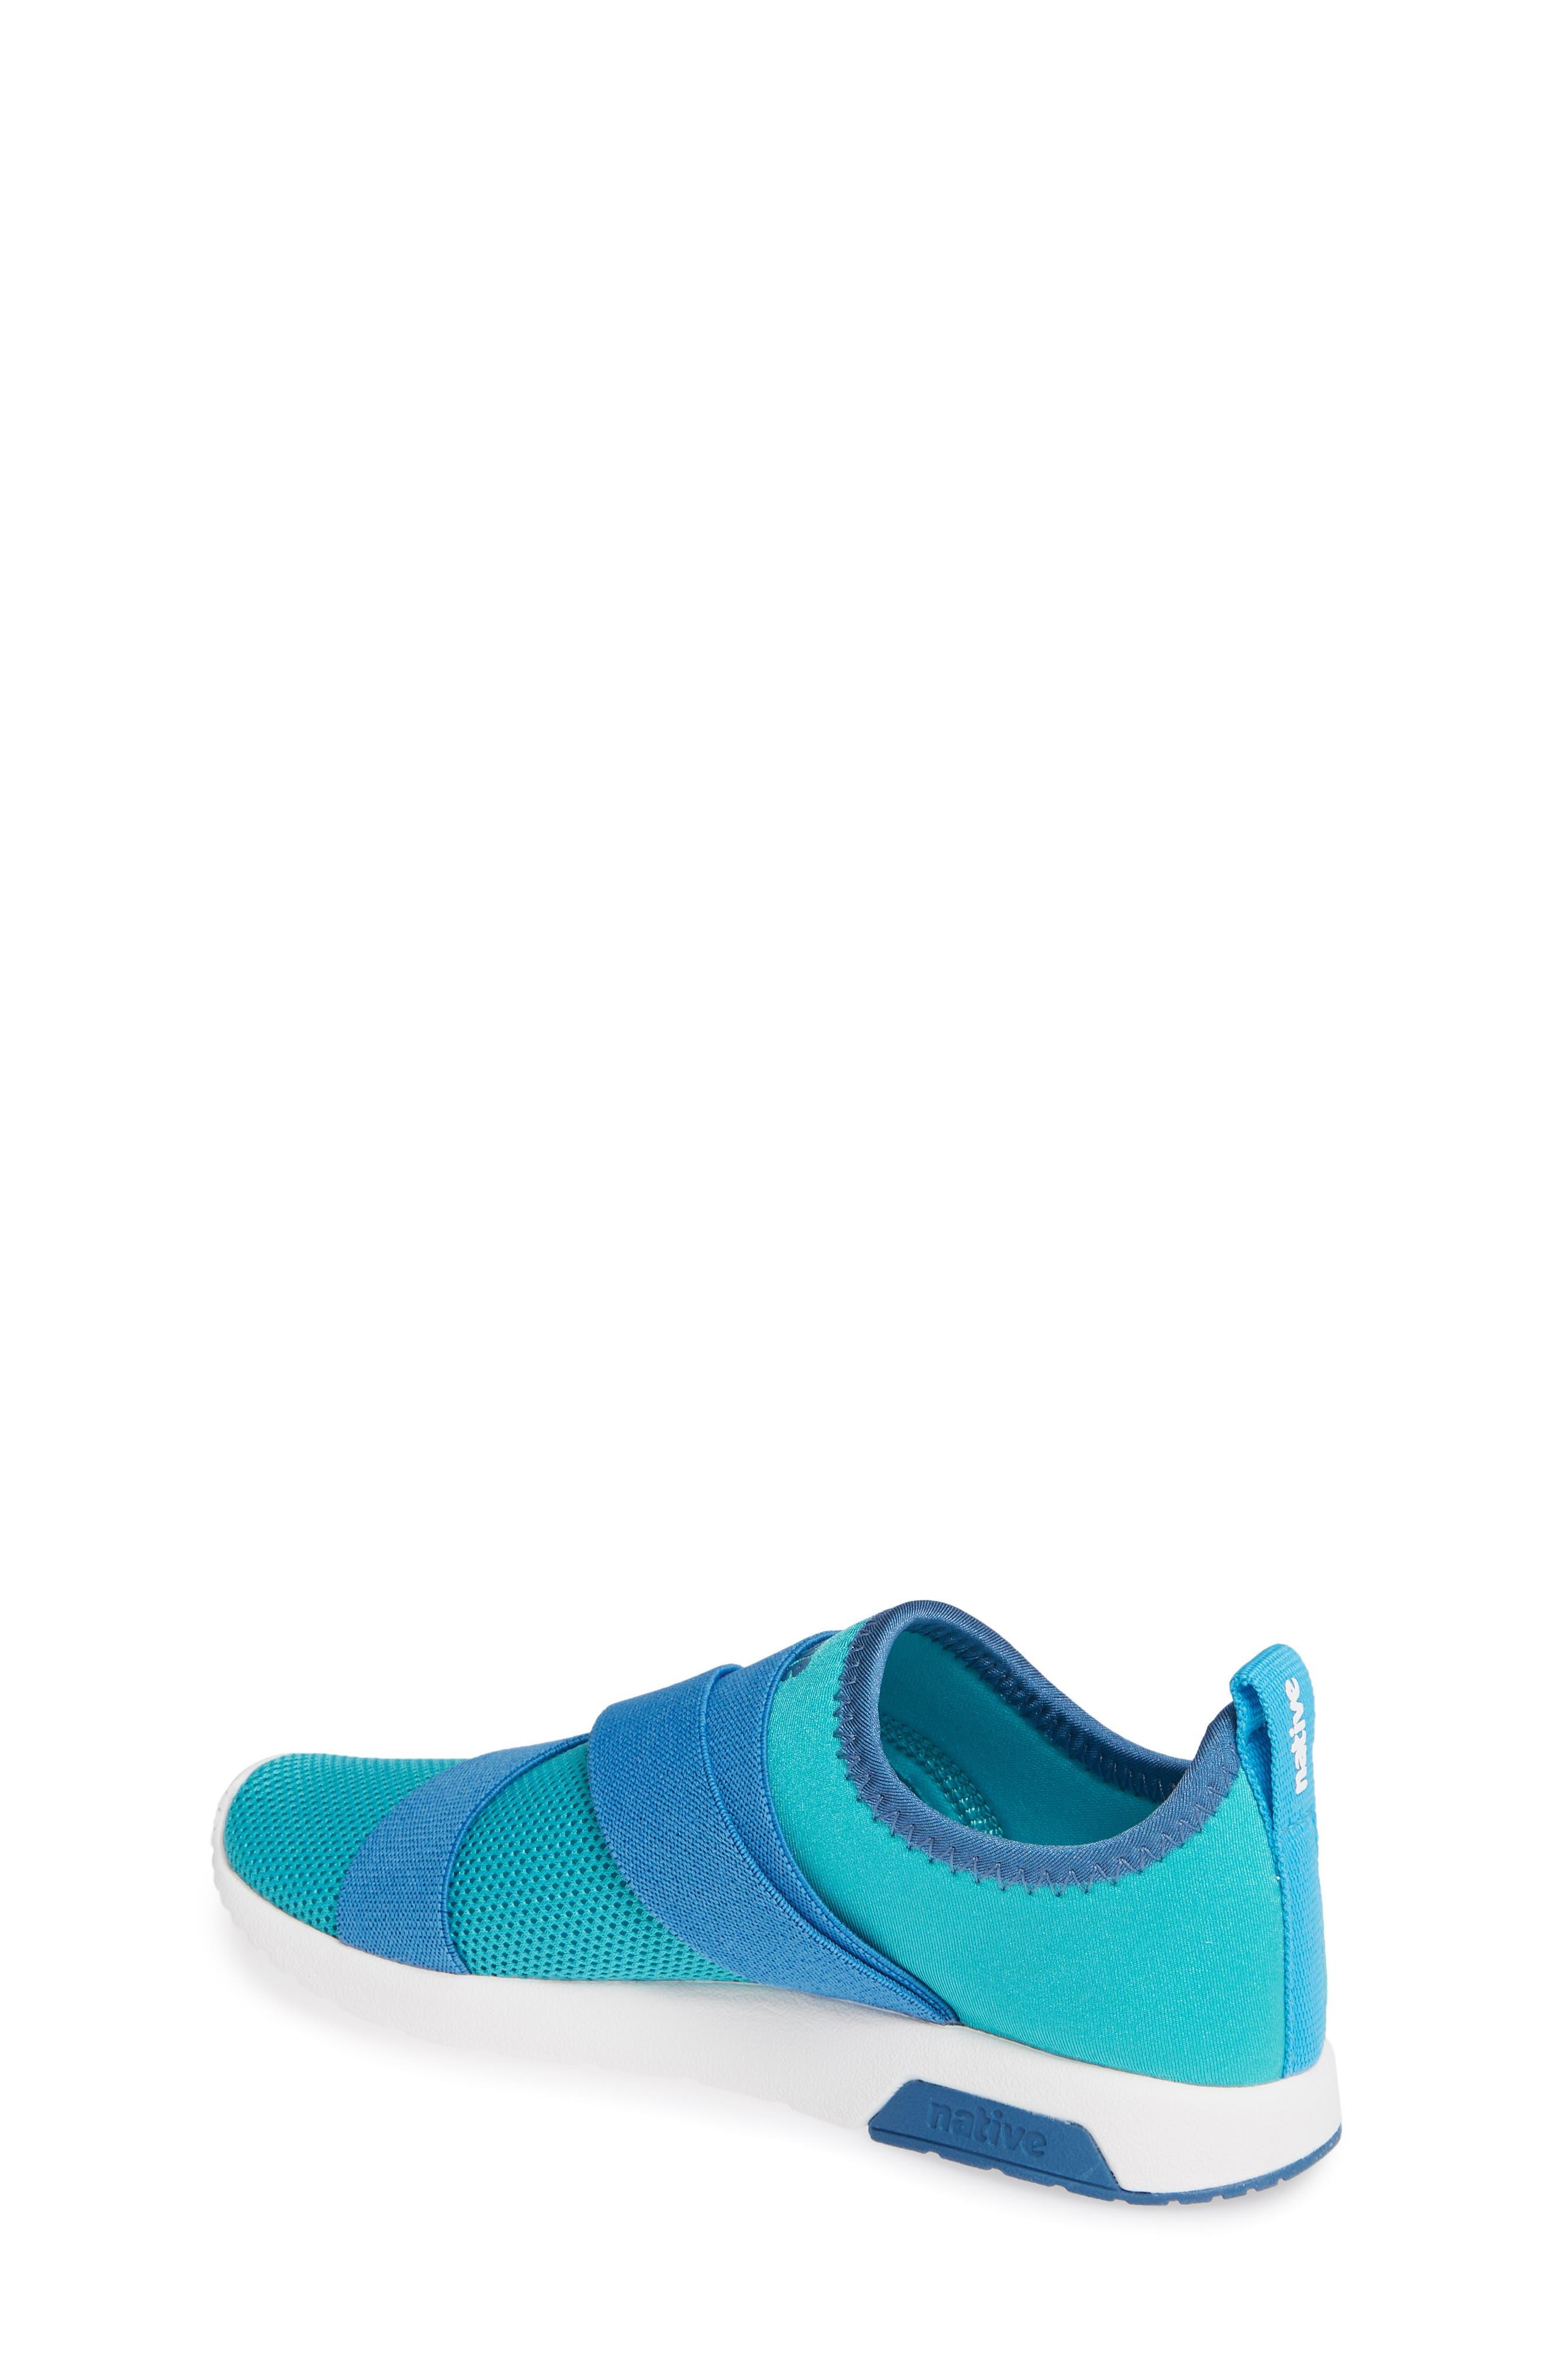 NATIVE SHOES,                             Phoenix Slip-On Vegan Sneaker,                             Alternate thumbnail 2, color,                             GLACIER GREEN/ BLUE/ WHITE